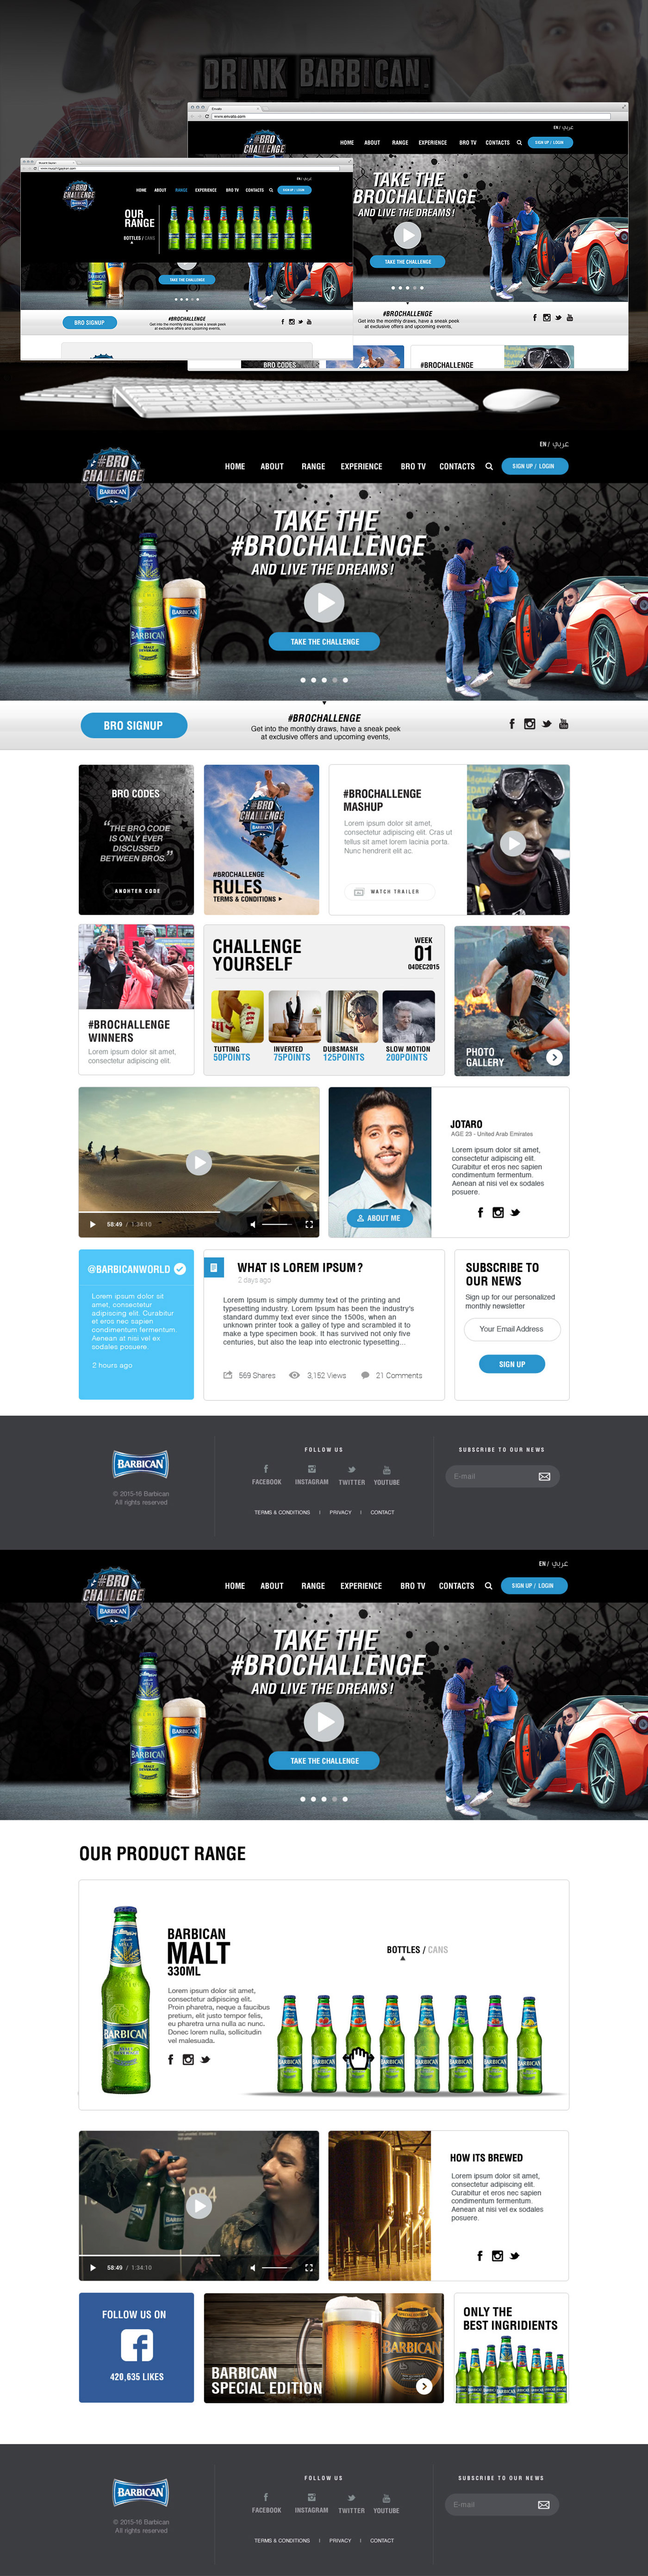 barbicanworld brochallenge barbicancampaign barbicanwebsite facetoface uae_website azizdesigner abdulazizportfolio